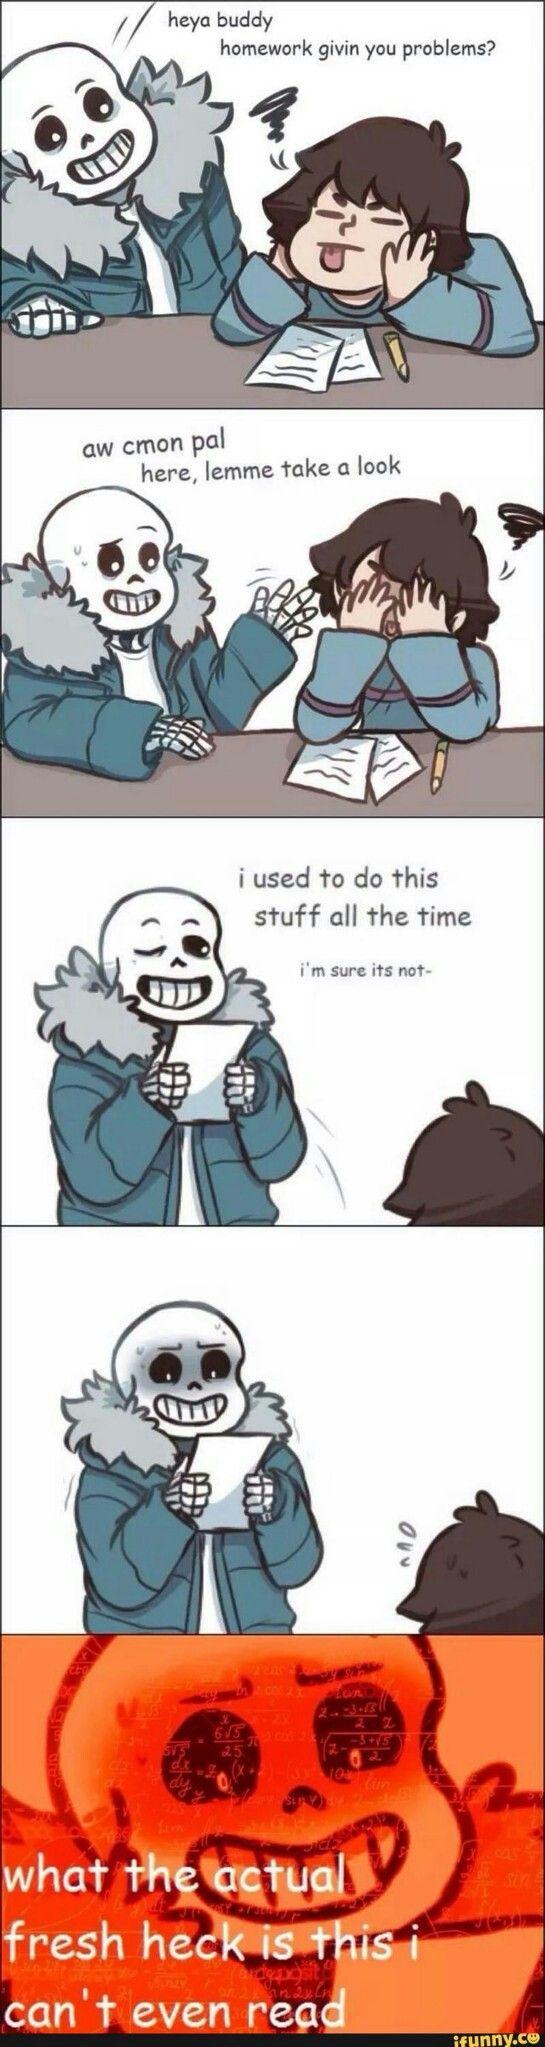 comic sans homework